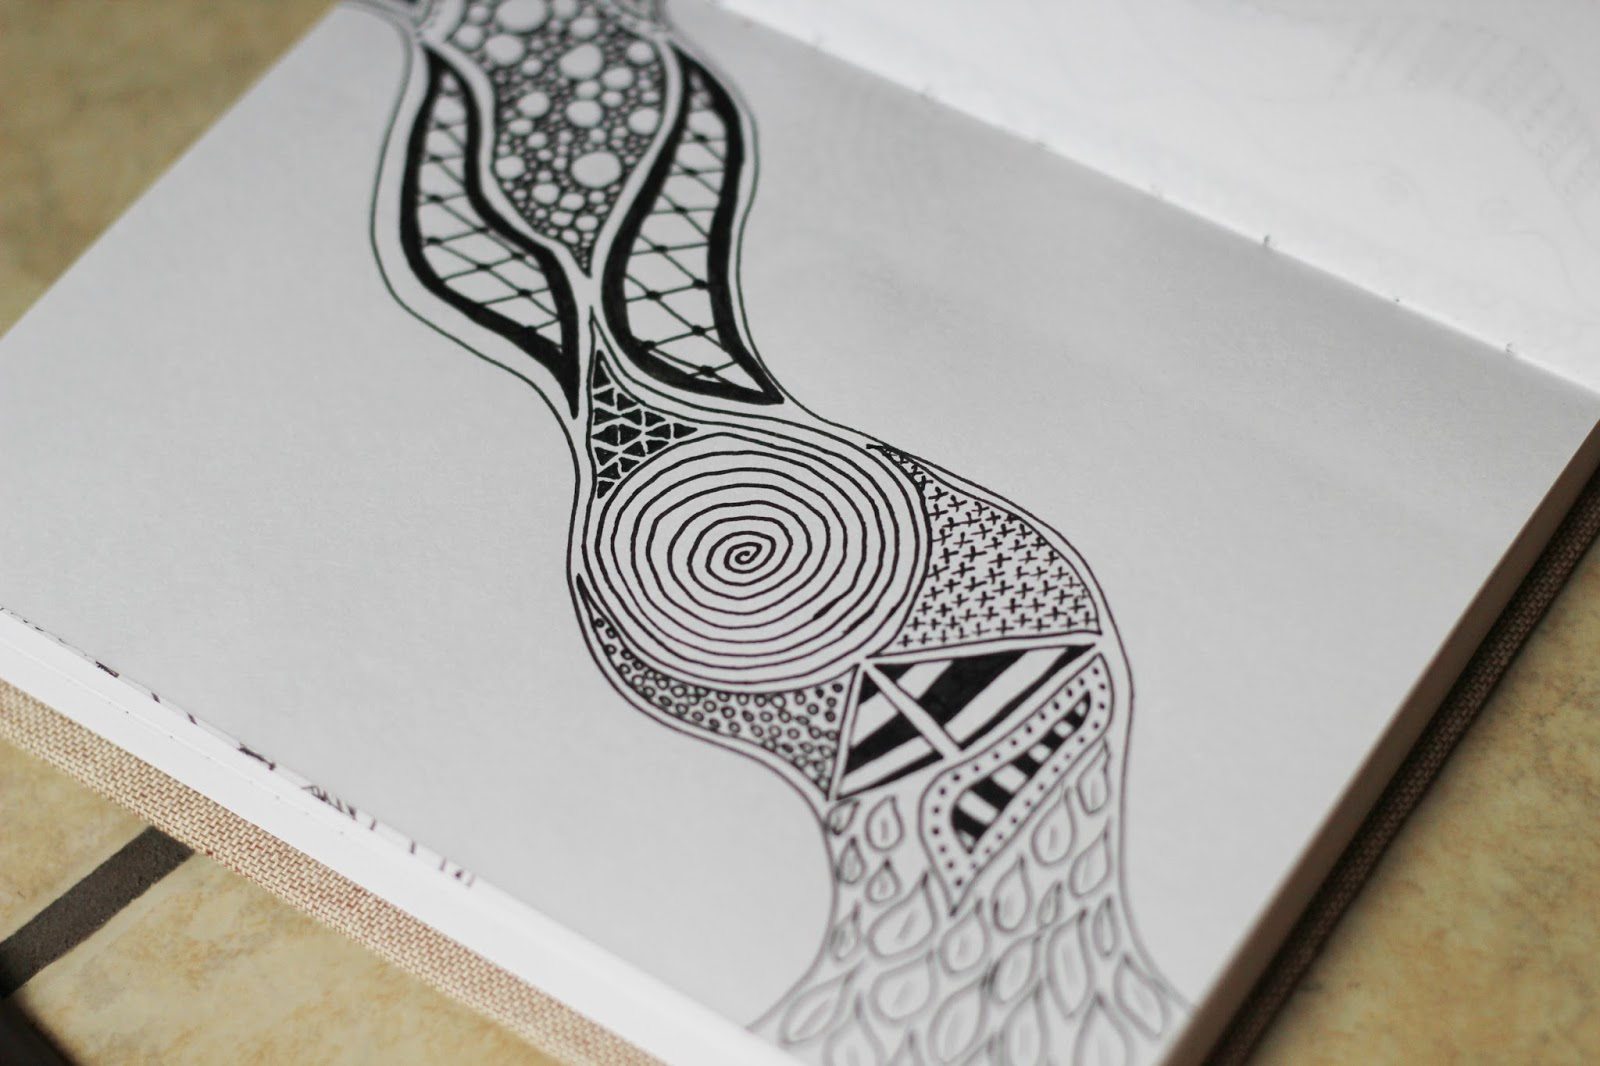 Cool Drawing Designs | Joy Studio Design Gallery - Best Design